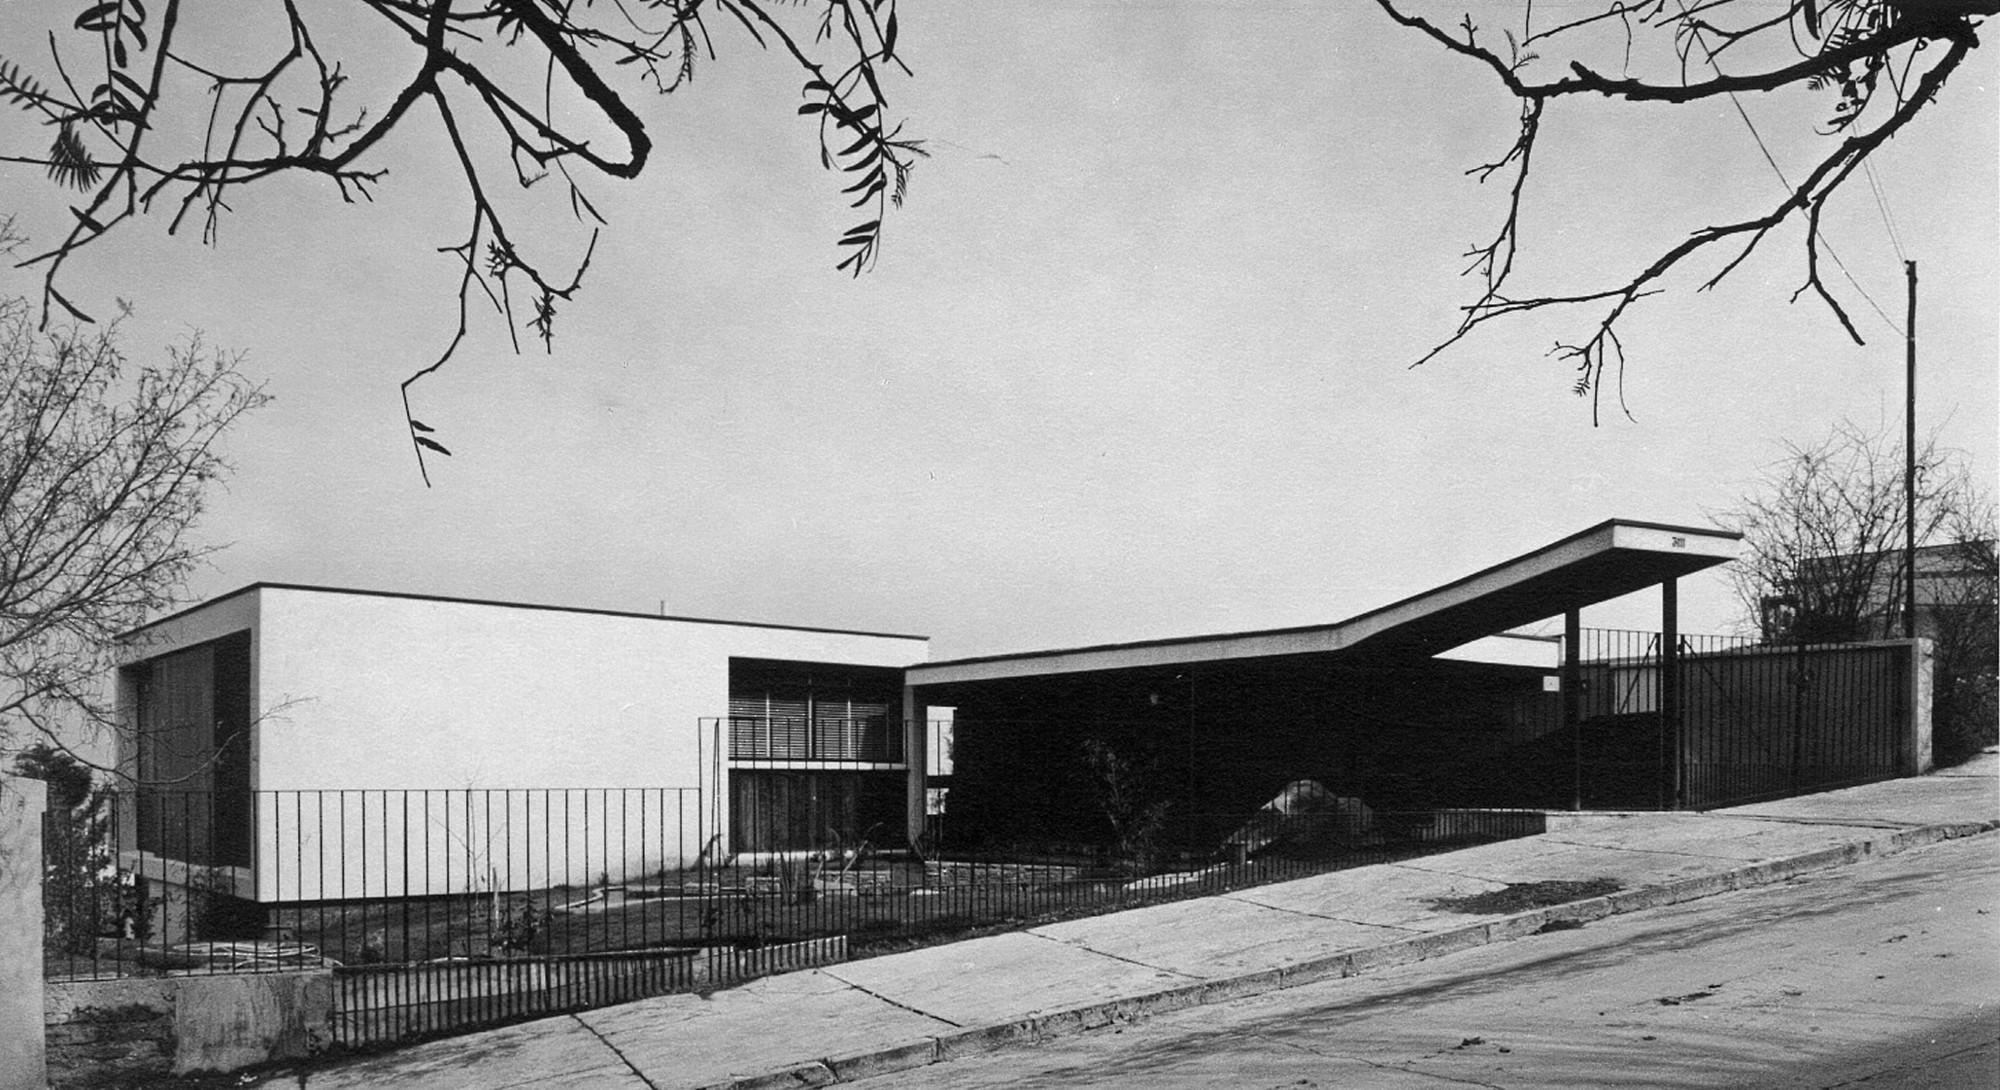 Clásicos de Arquitectura: Casa Rechmeier-Siewekw / Pablo Hegedüs Fekete & Carlos Bravo Valdés, © Foto Kabath, 1969